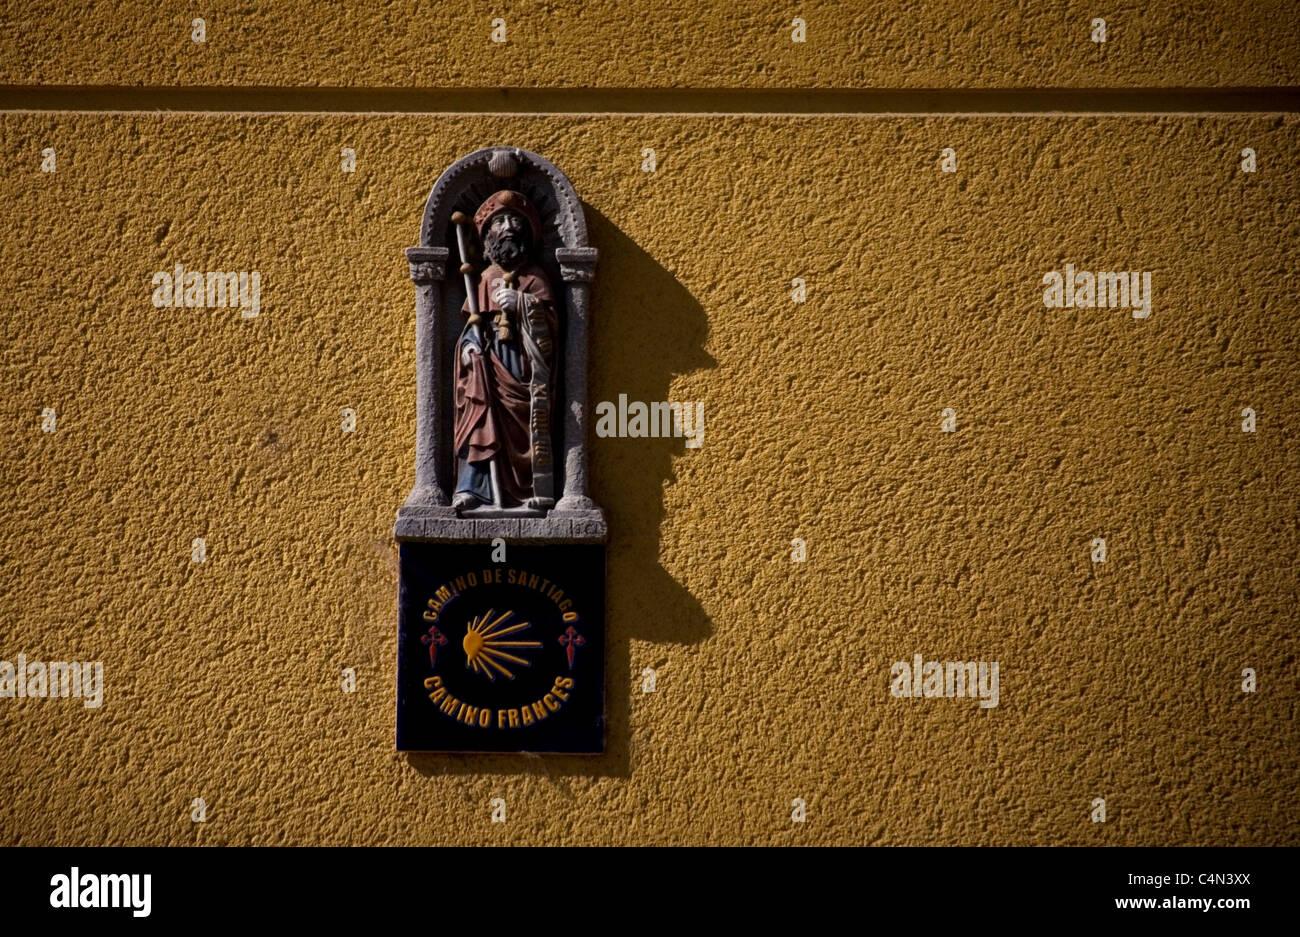 A Saint James sculpture decorates a house facade in the French Way of St. James Way, El Bierzo region, Castilla - Stock Image